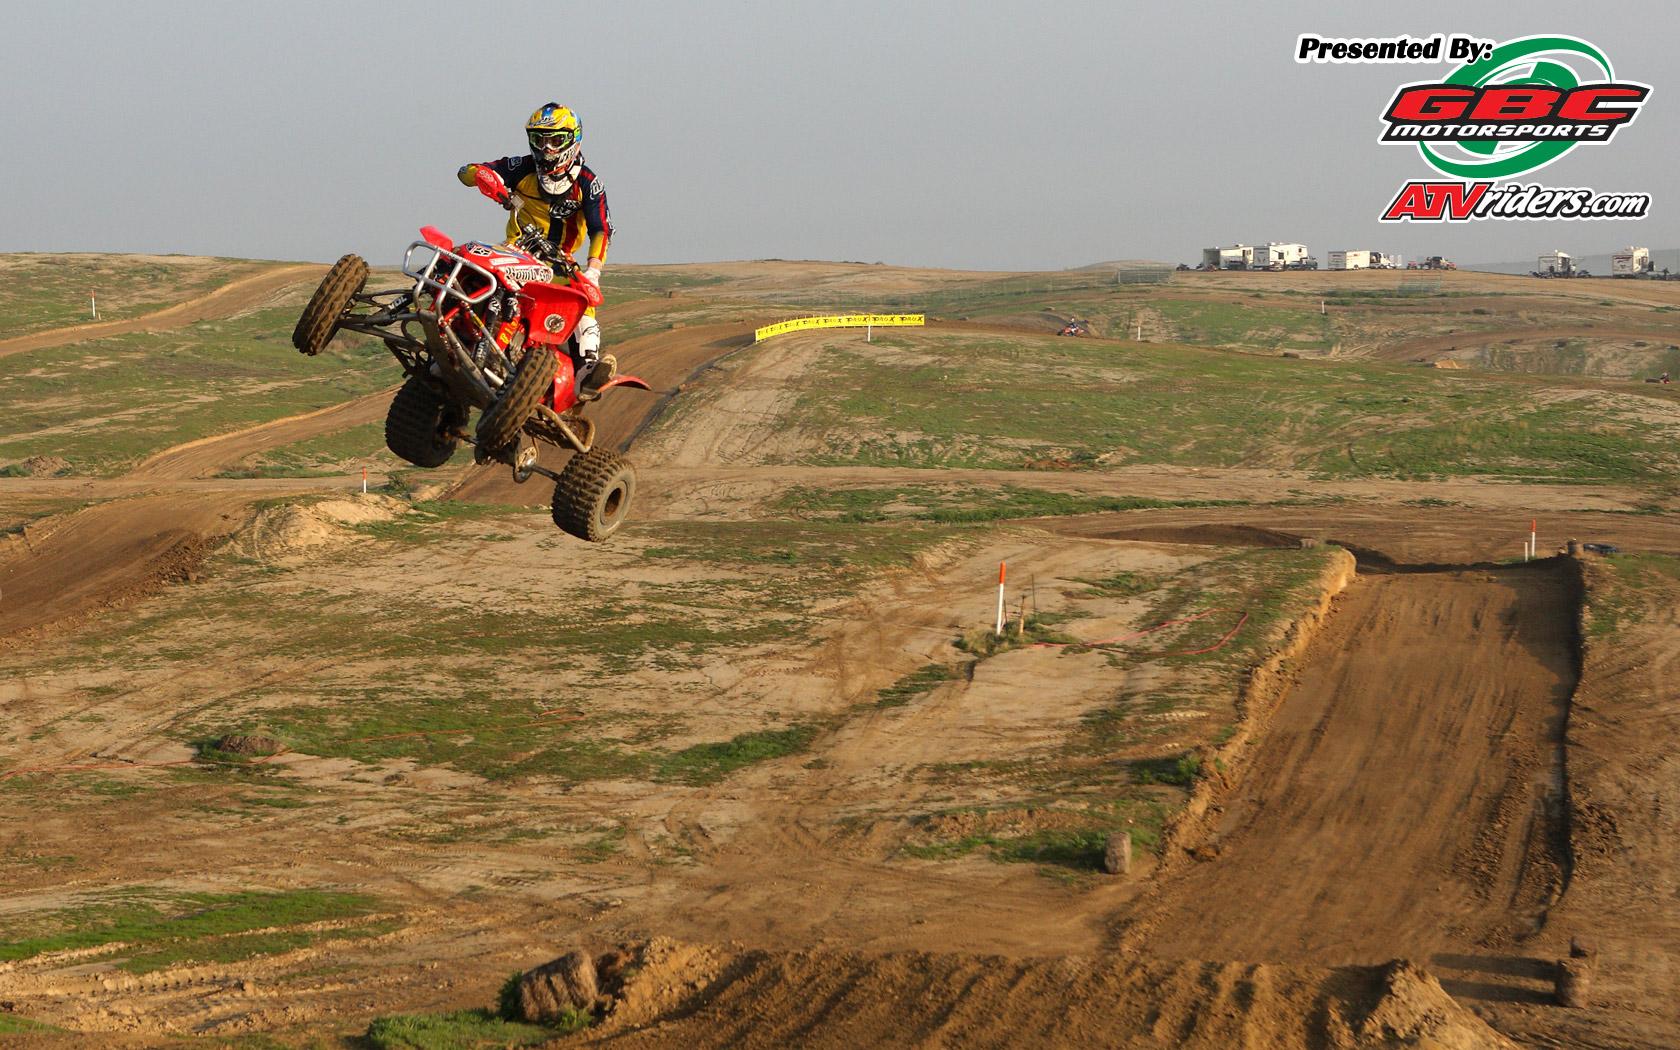 2010 Ama Atv Motocross Pro Champion Josh Creamer